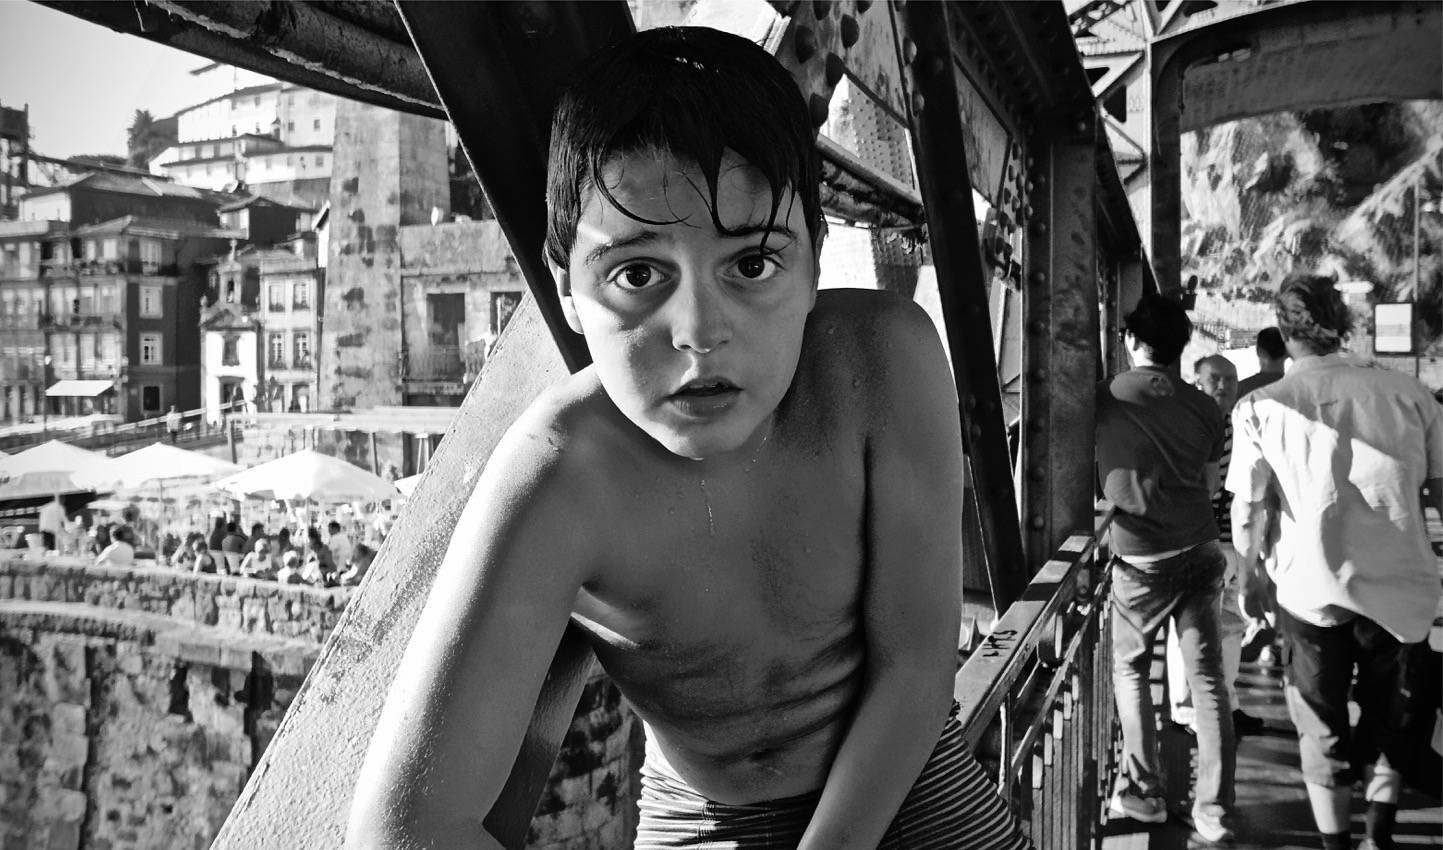 Ponte Dom Luis I 60 x 90 Massimiliano Scarpa Photographer 2013 copia